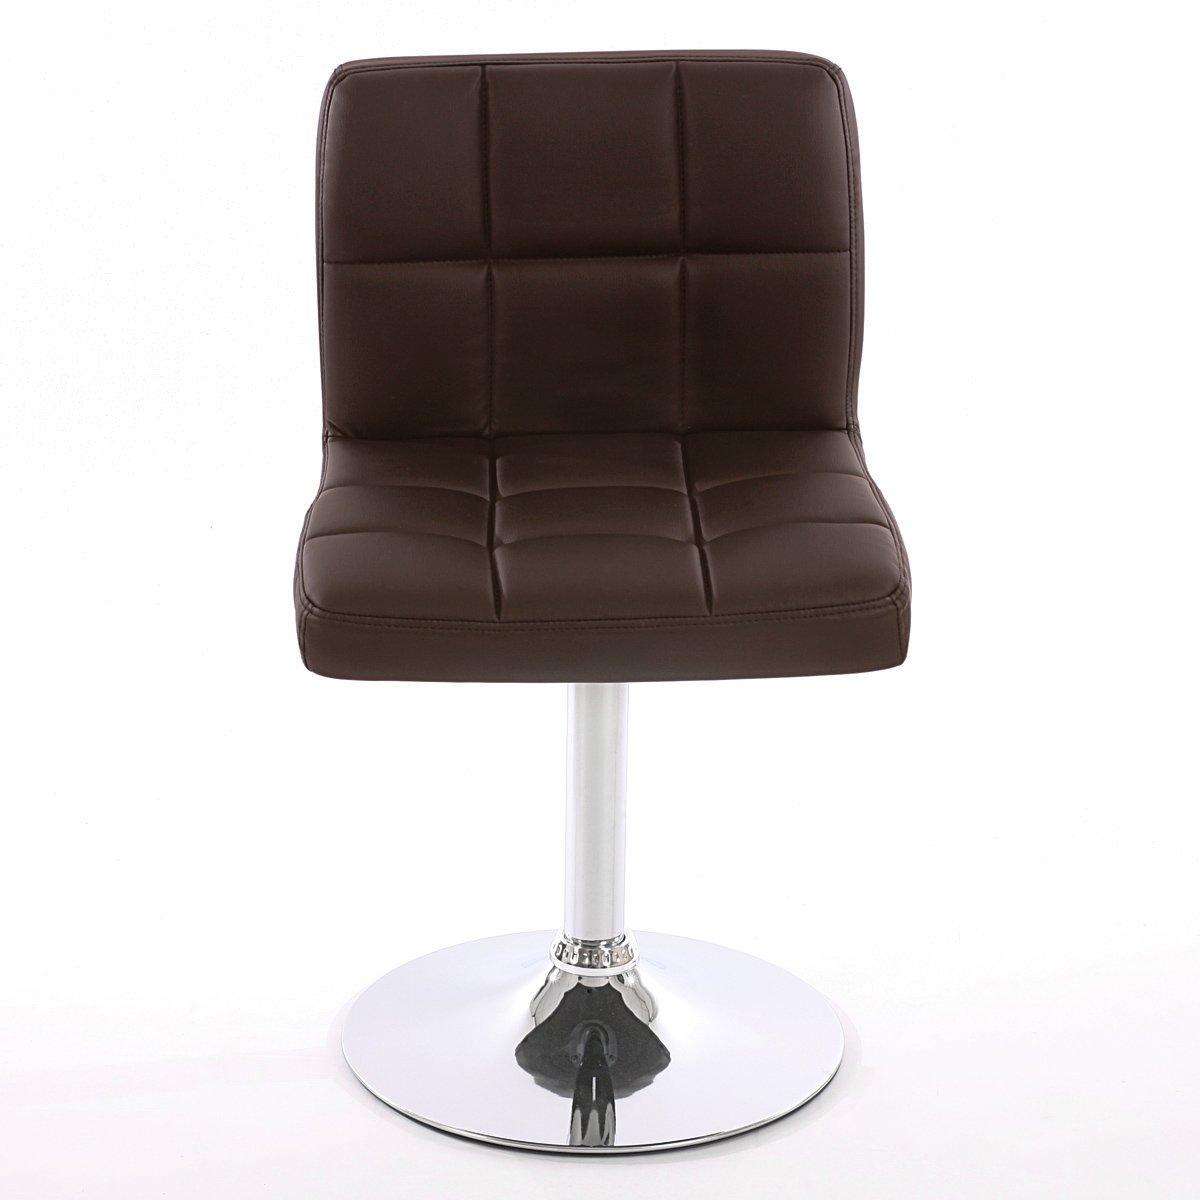 Conjunto de 6 sillas de cocina genova giratorias for Conjunto sillas comedor